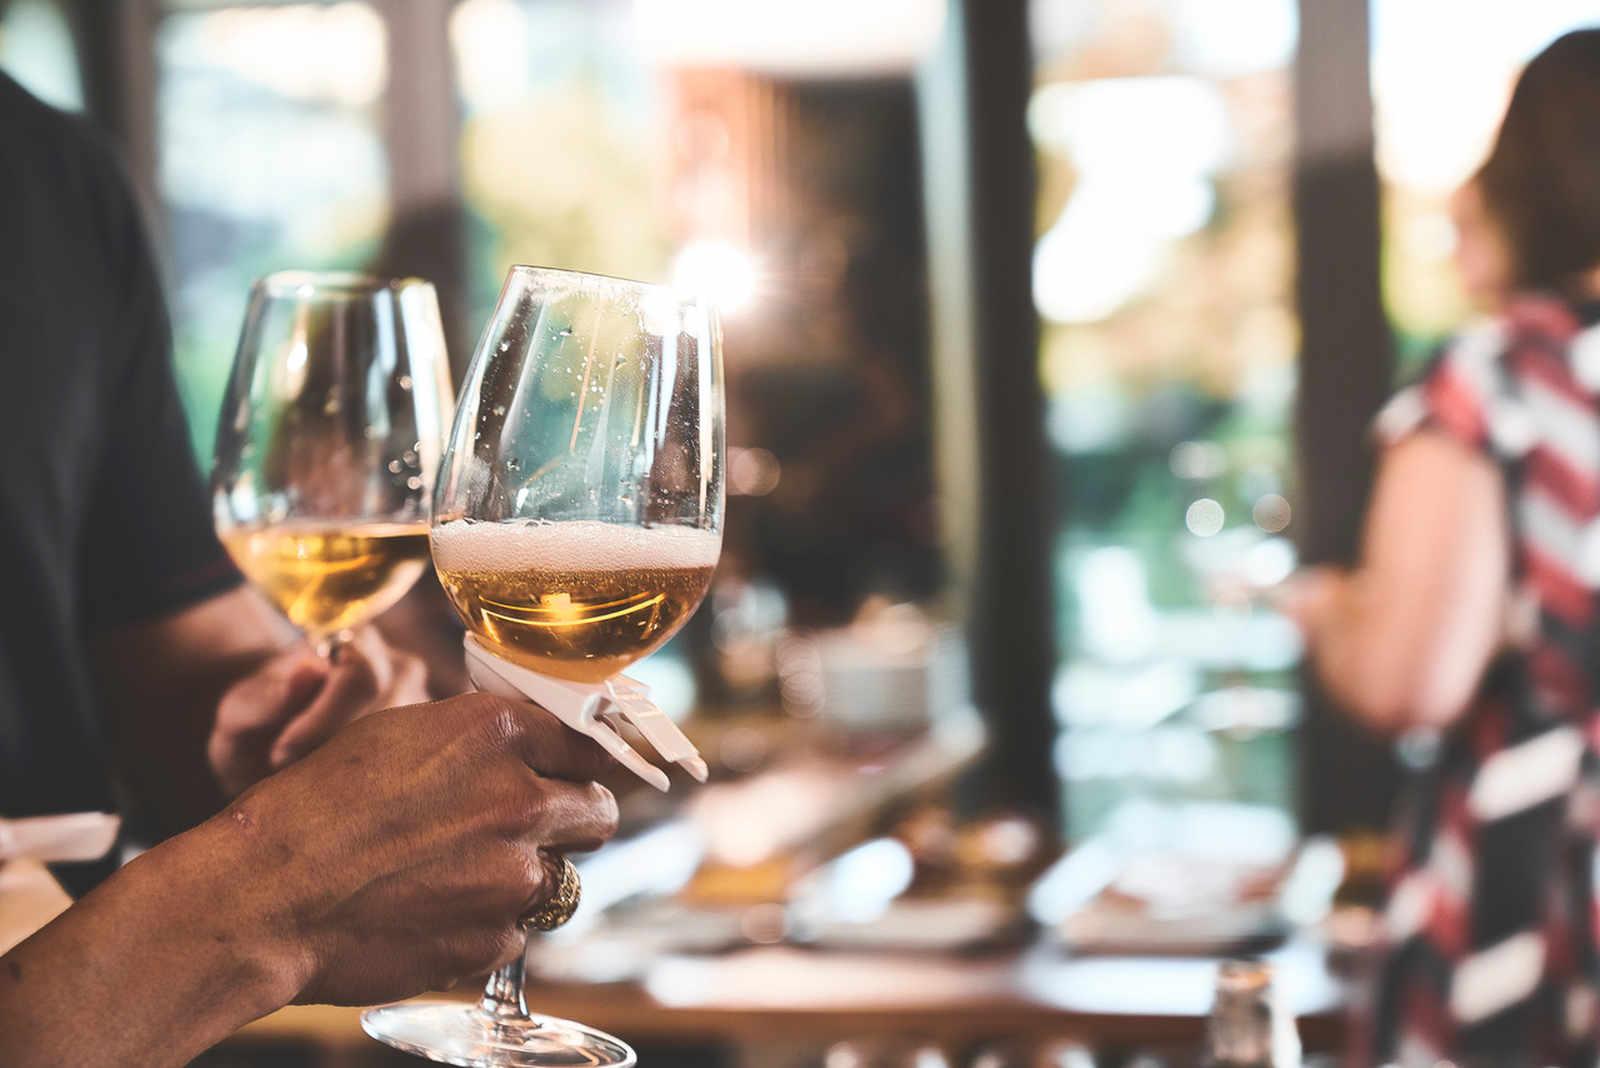 Portuguese wines at Torel Avantgarde restaurant